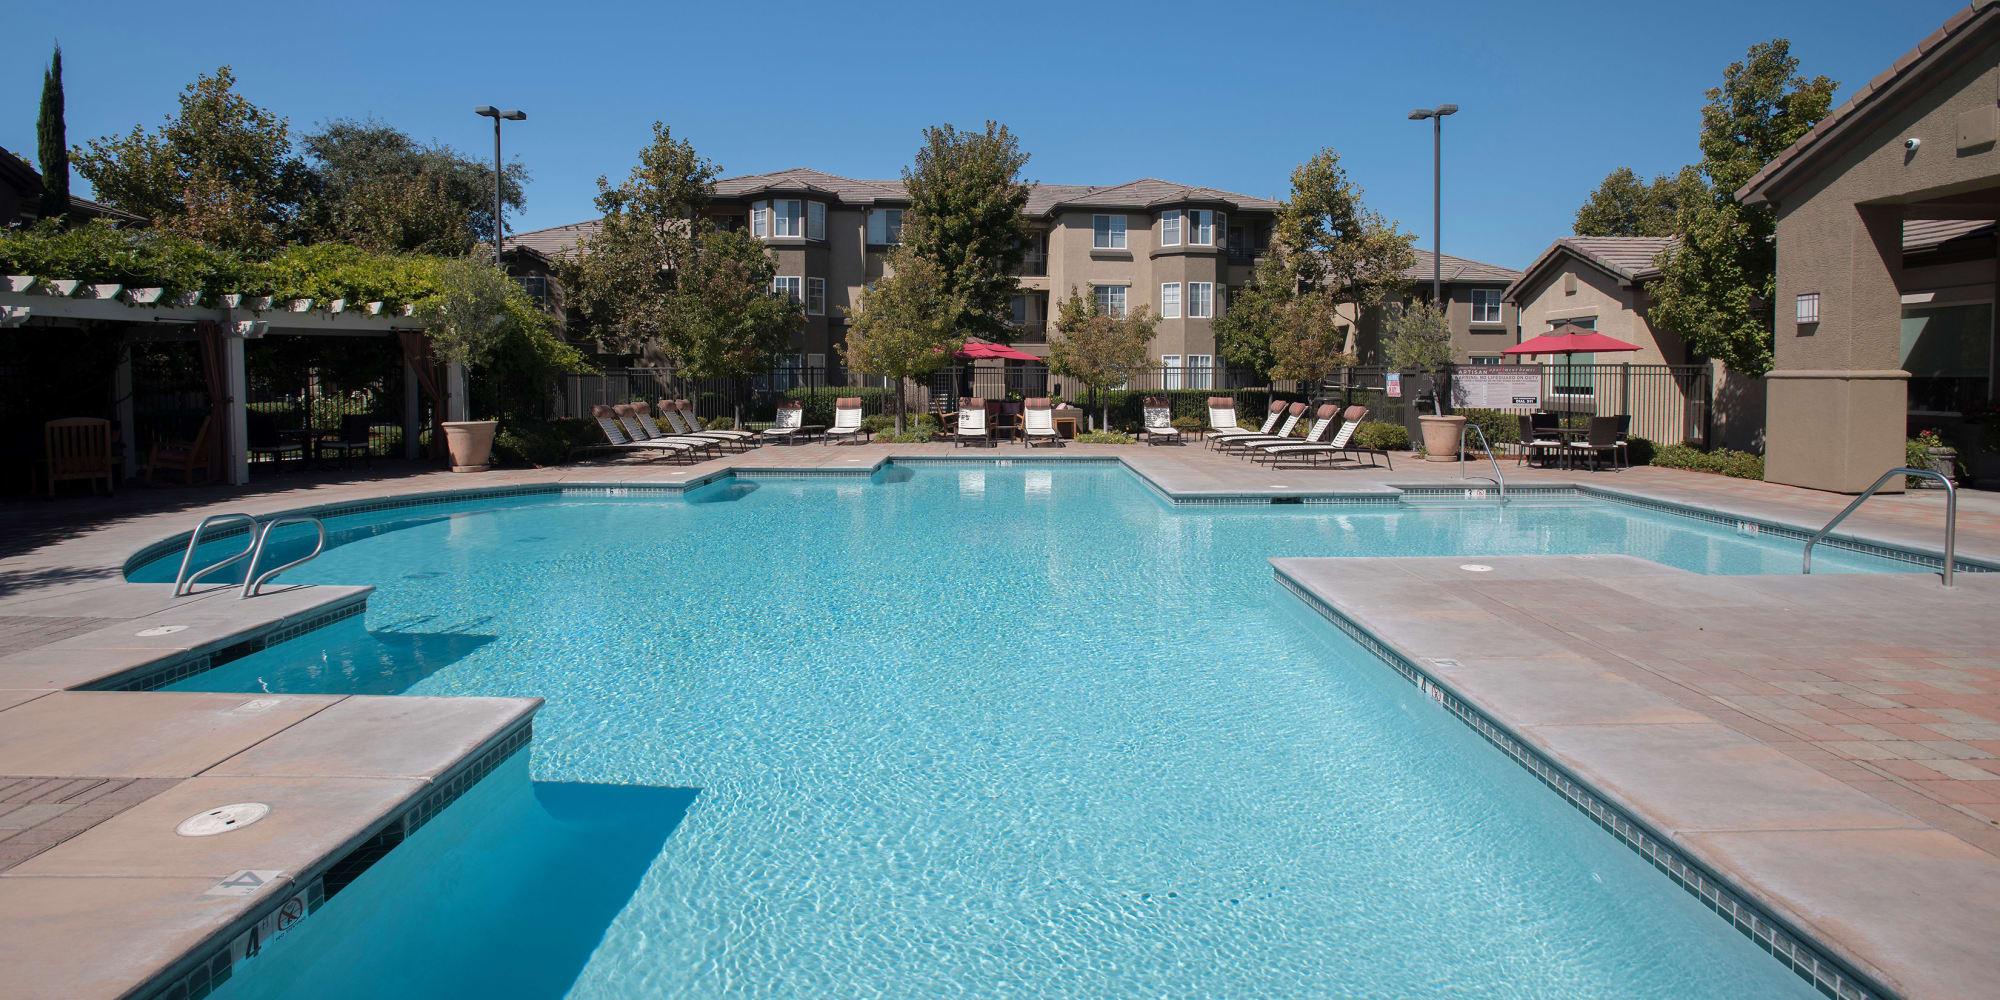 Apartments at The Artisan Apartment Homes in Sacramento, California